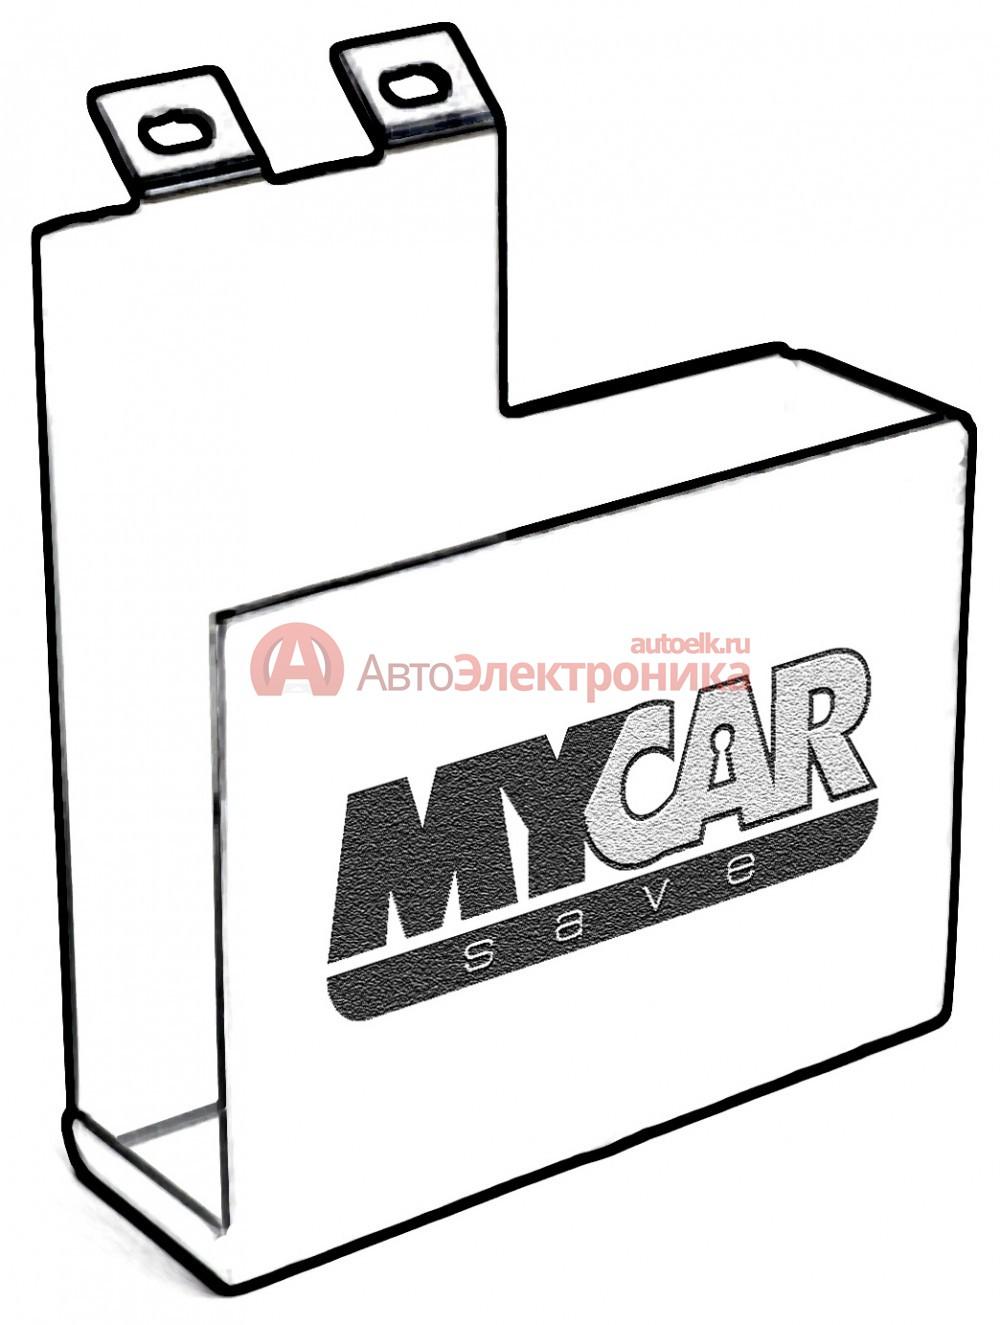 MyCarSave MCS-1413 Защитный бокс ЭБУ Toyota Camry (2011-2014) 2.0л / Lexus IS